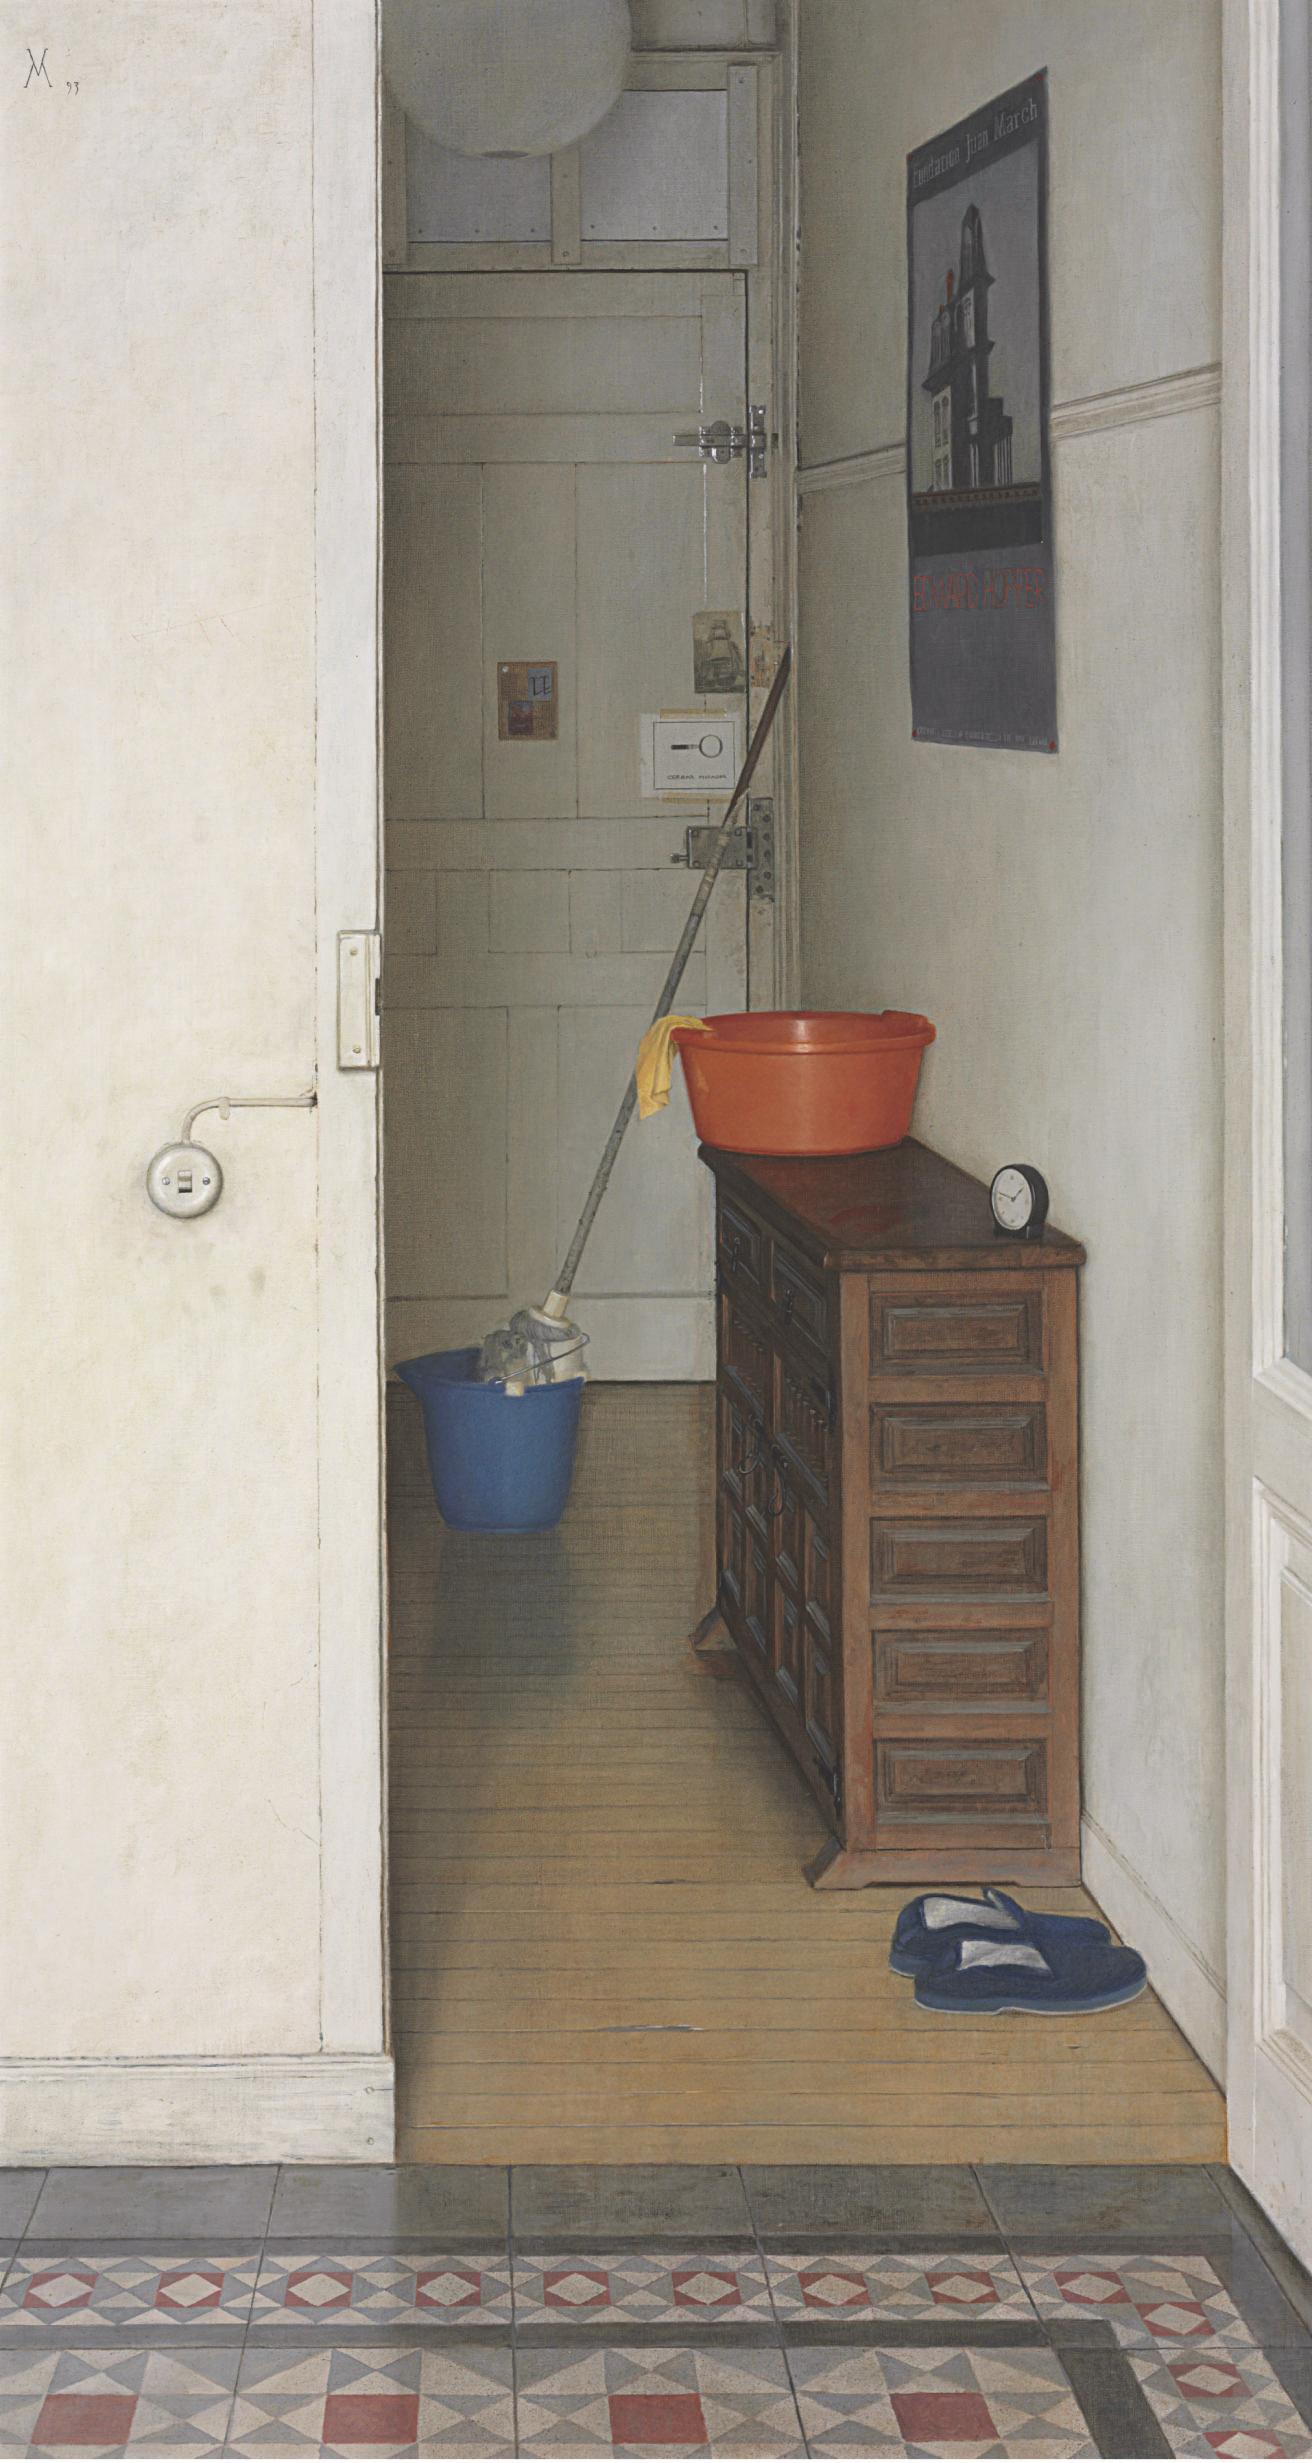 Untitled (Interior)